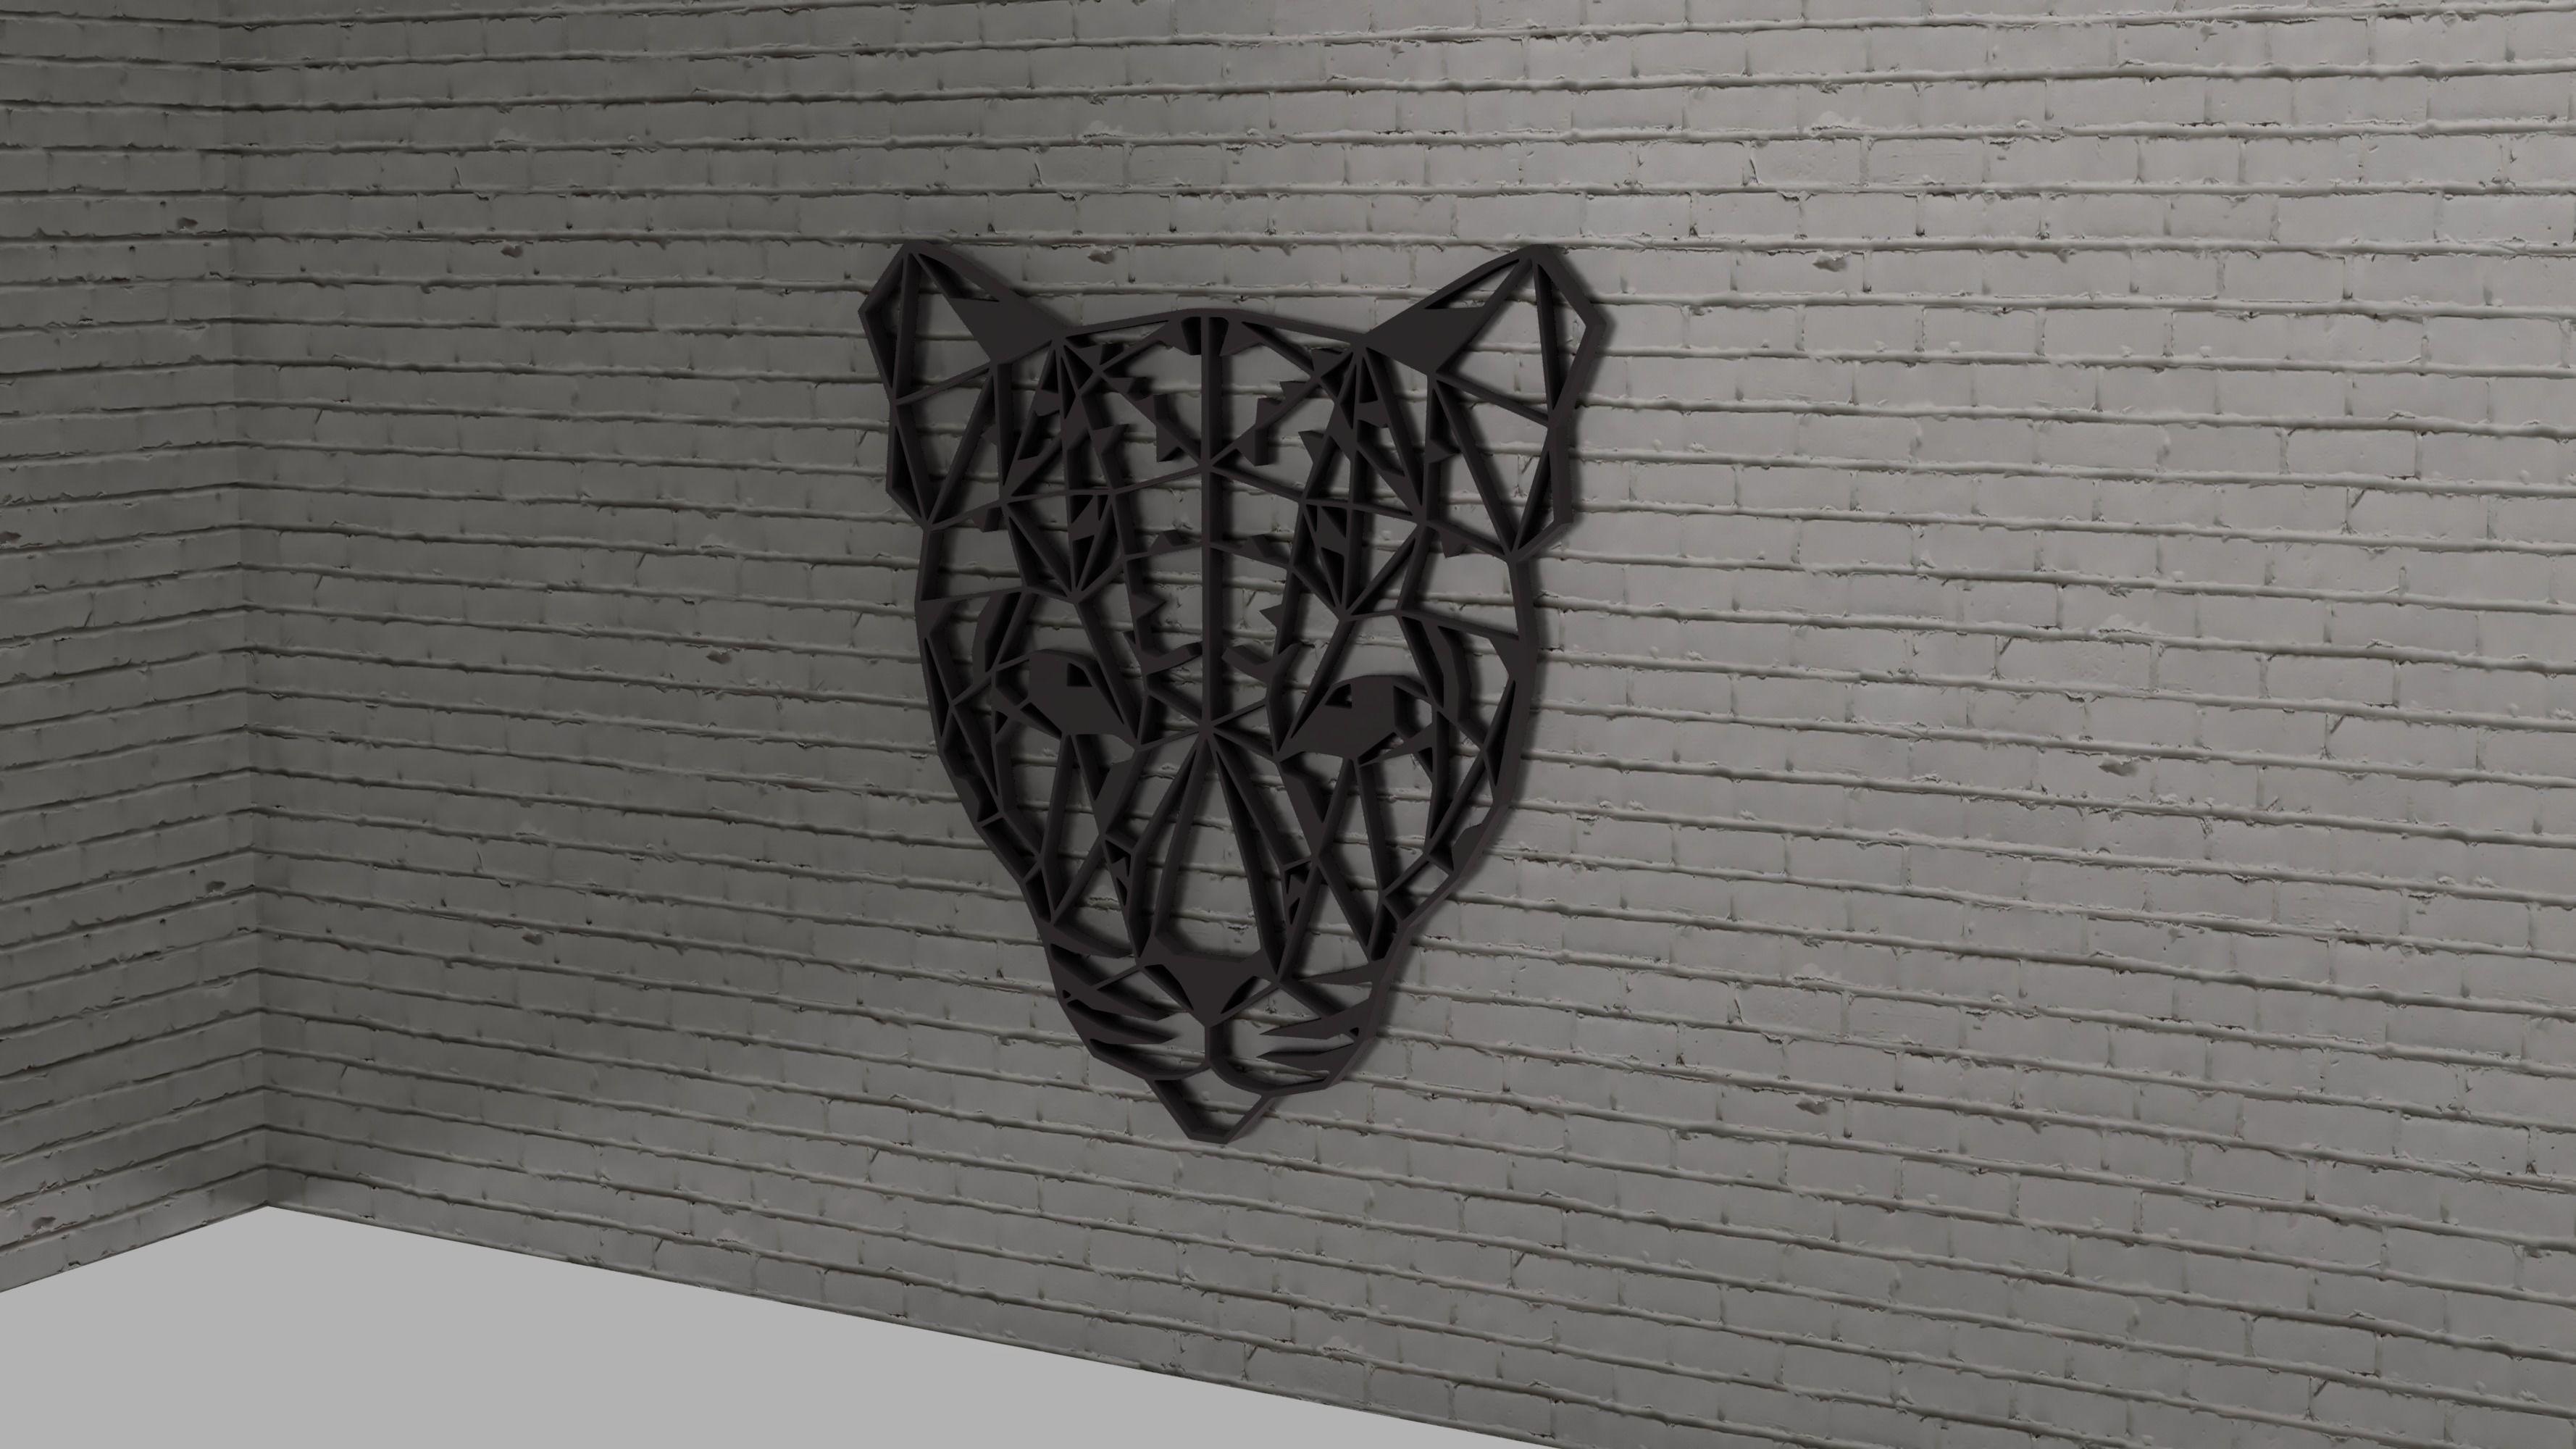 Jeopard head wall decoration